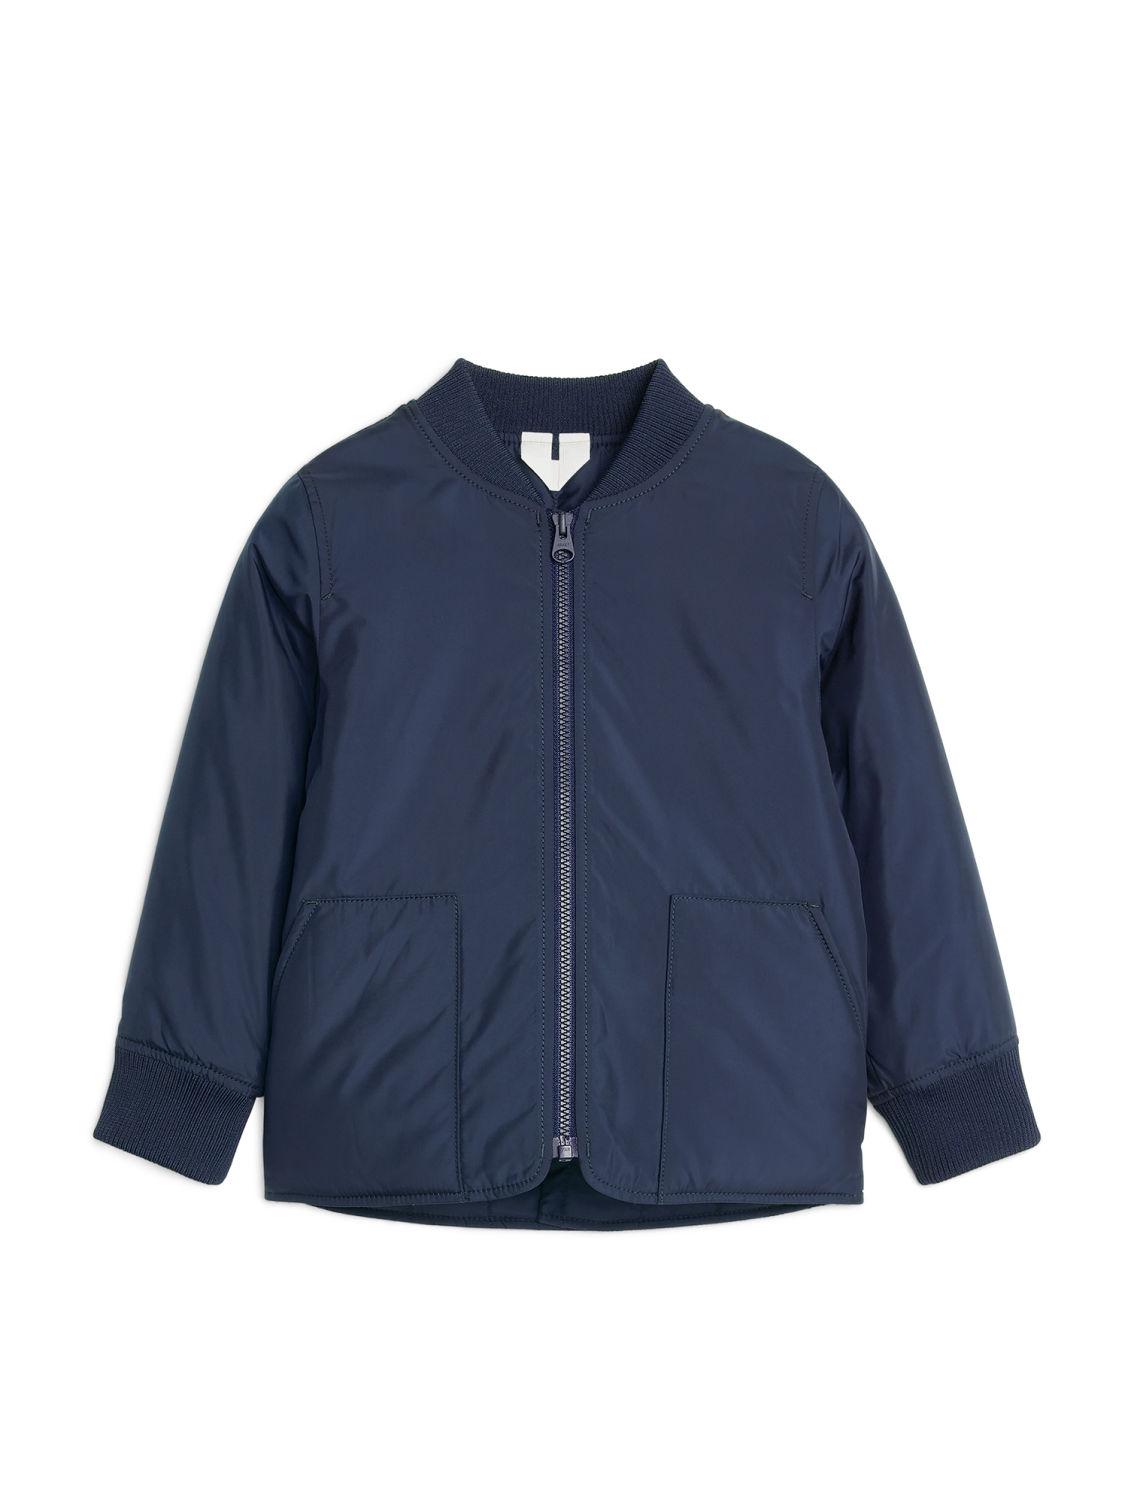 Padded Liner Jacket - Blue - Jackets & Coats - ARKET